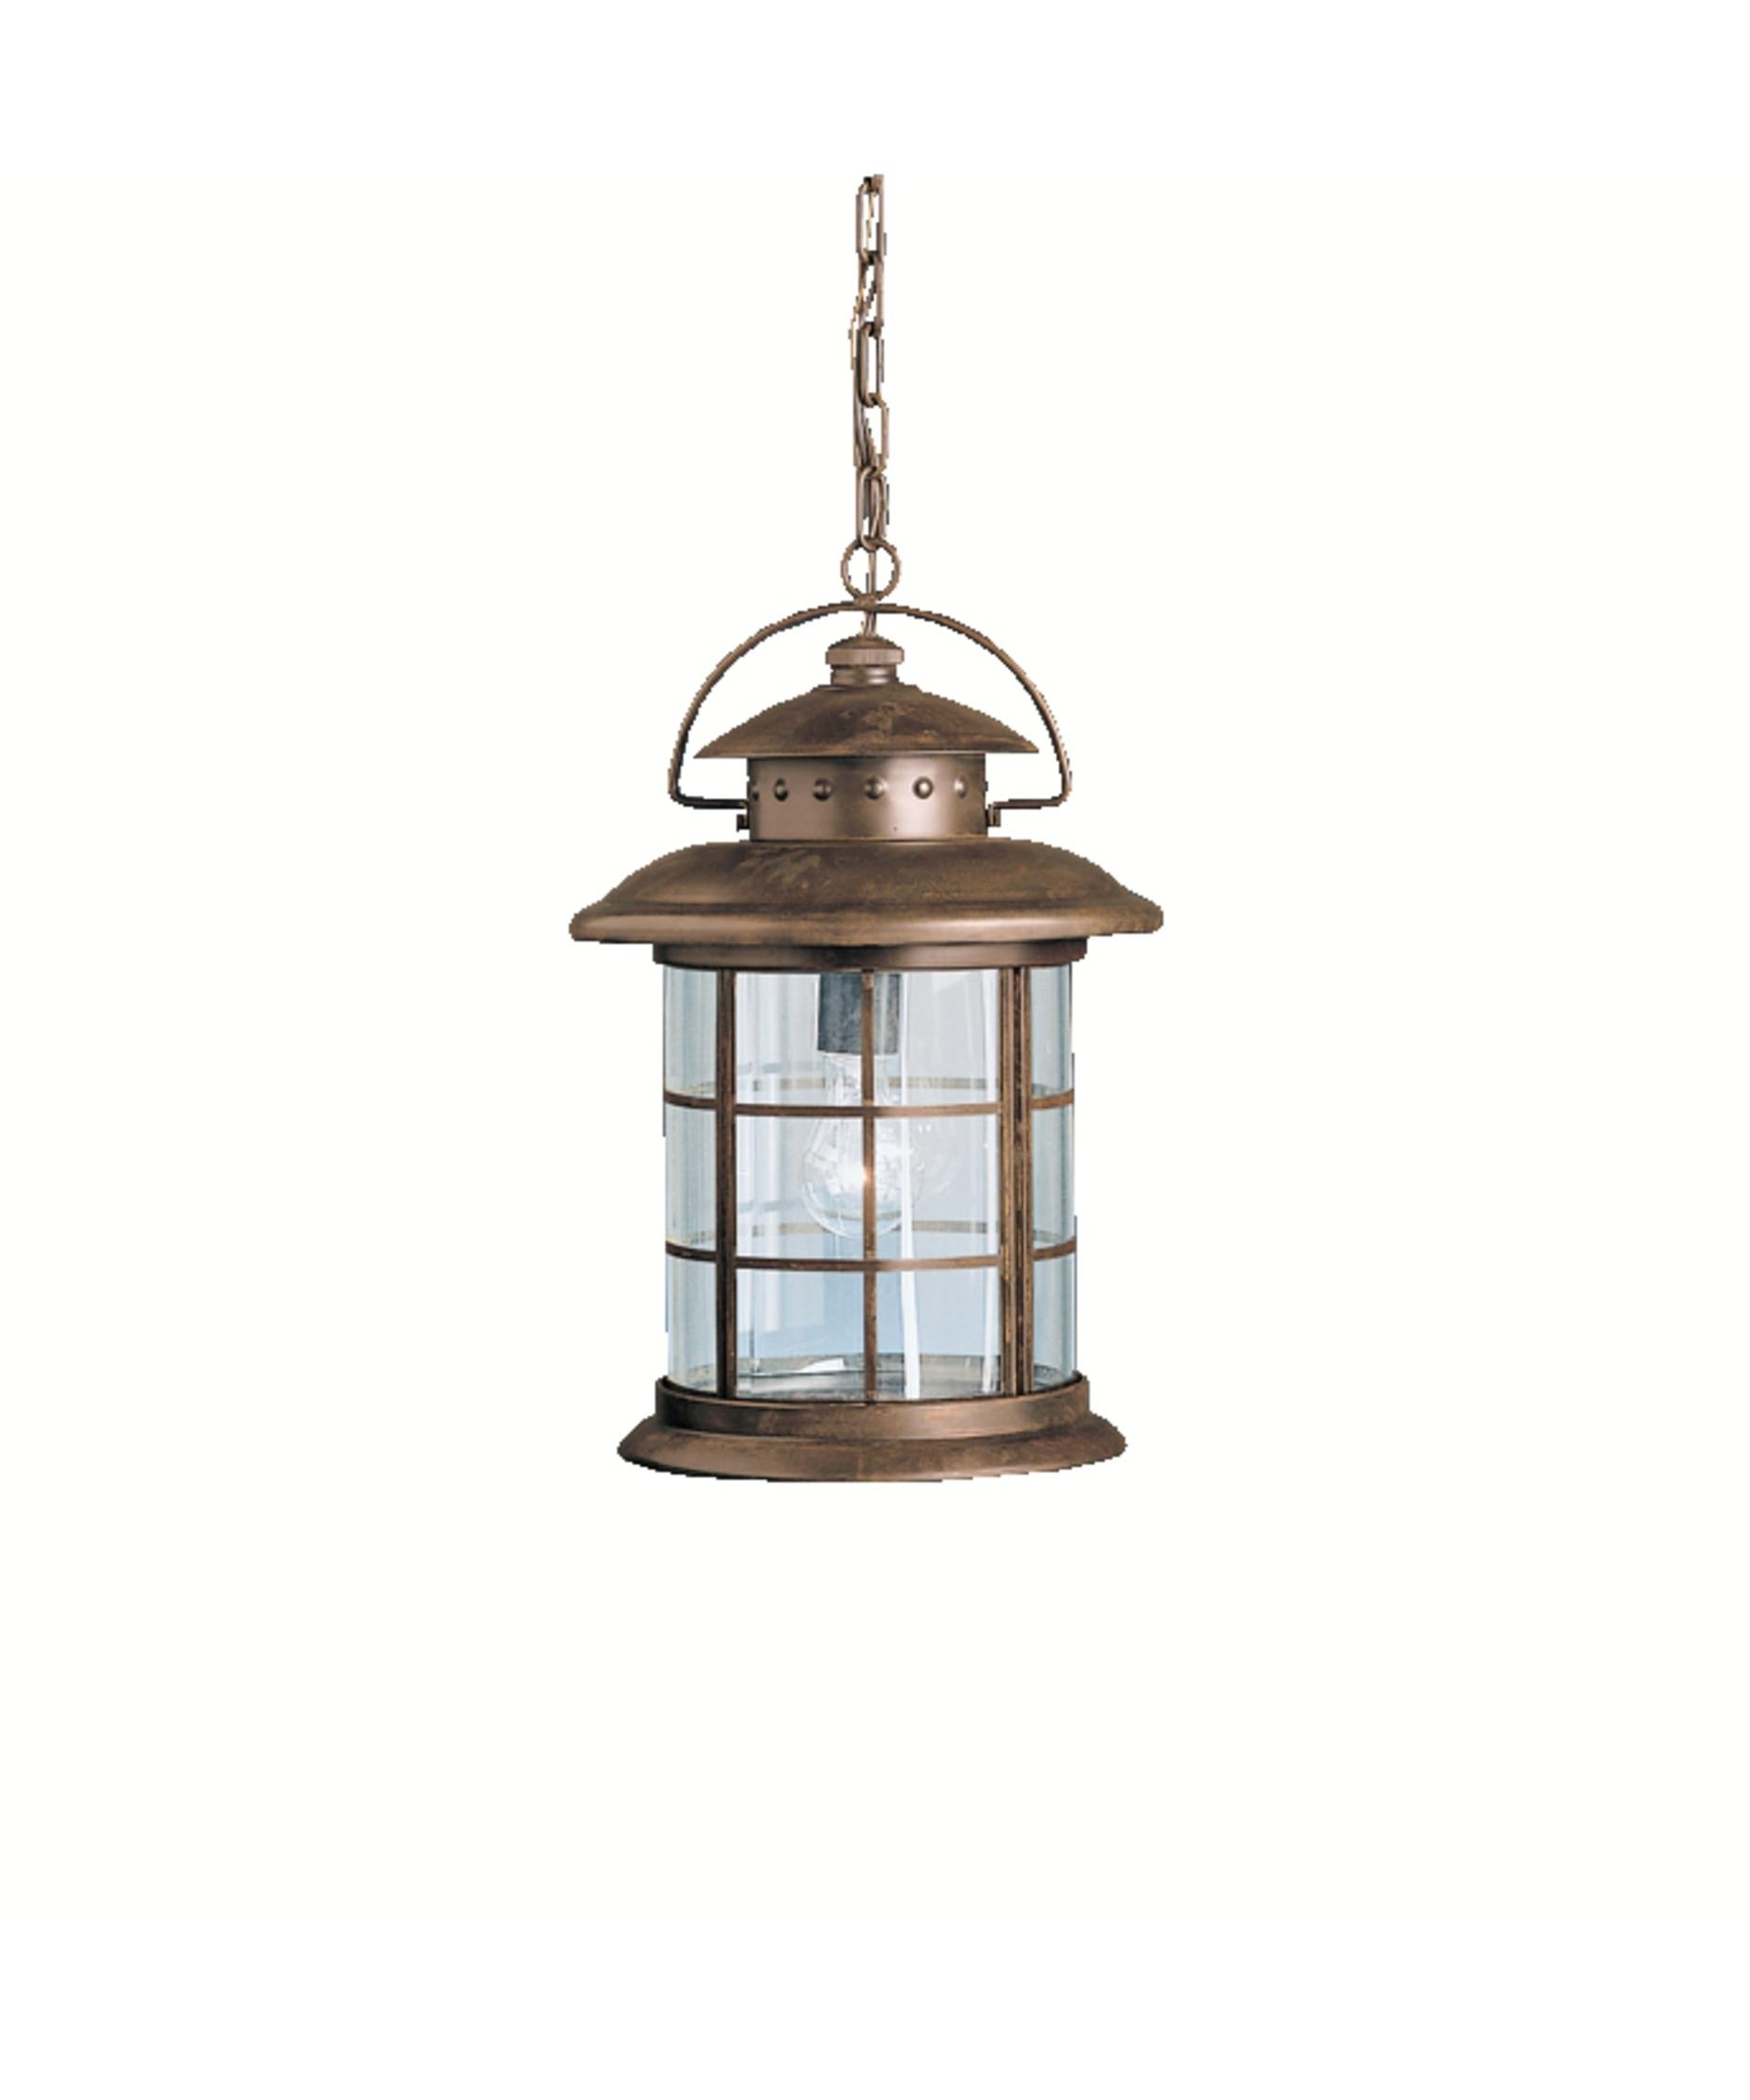 Kichler Ashland Bay Outdoor Pedestal Lantern Weathered: 15 Photo Of Kichler Outdoor Ceiling Lights